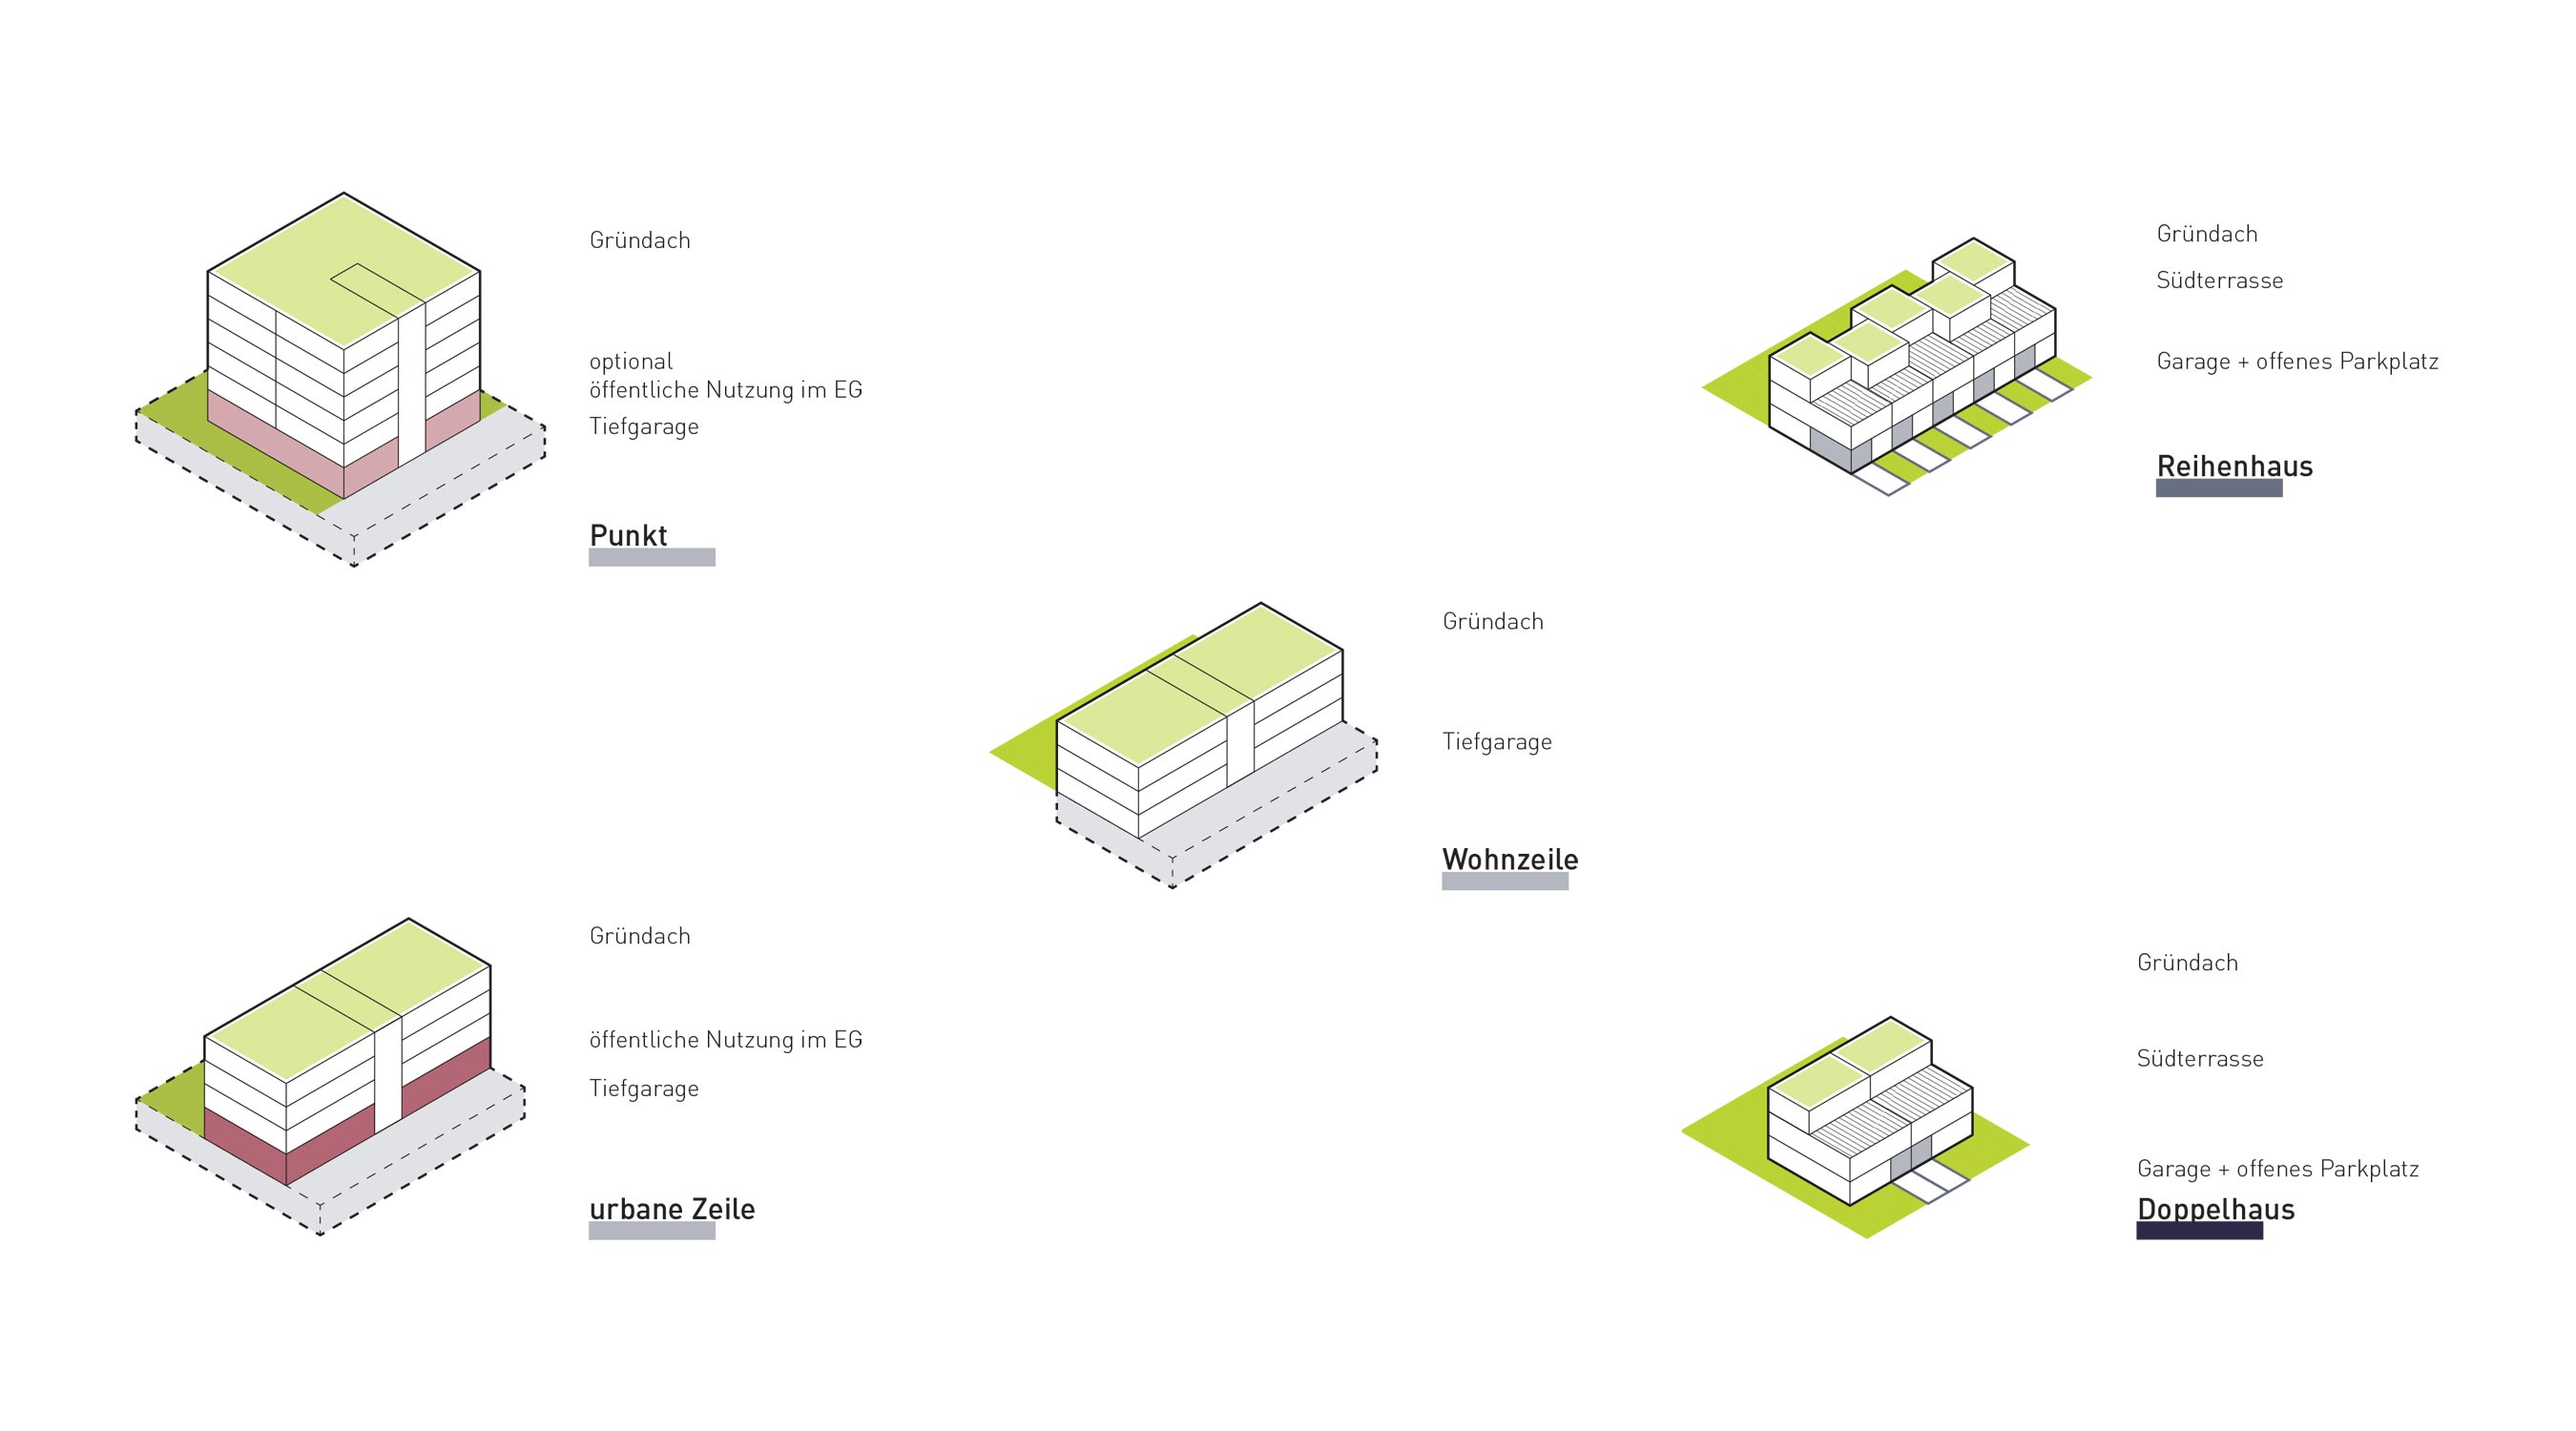 Yellow z start for Architektur axonometrie